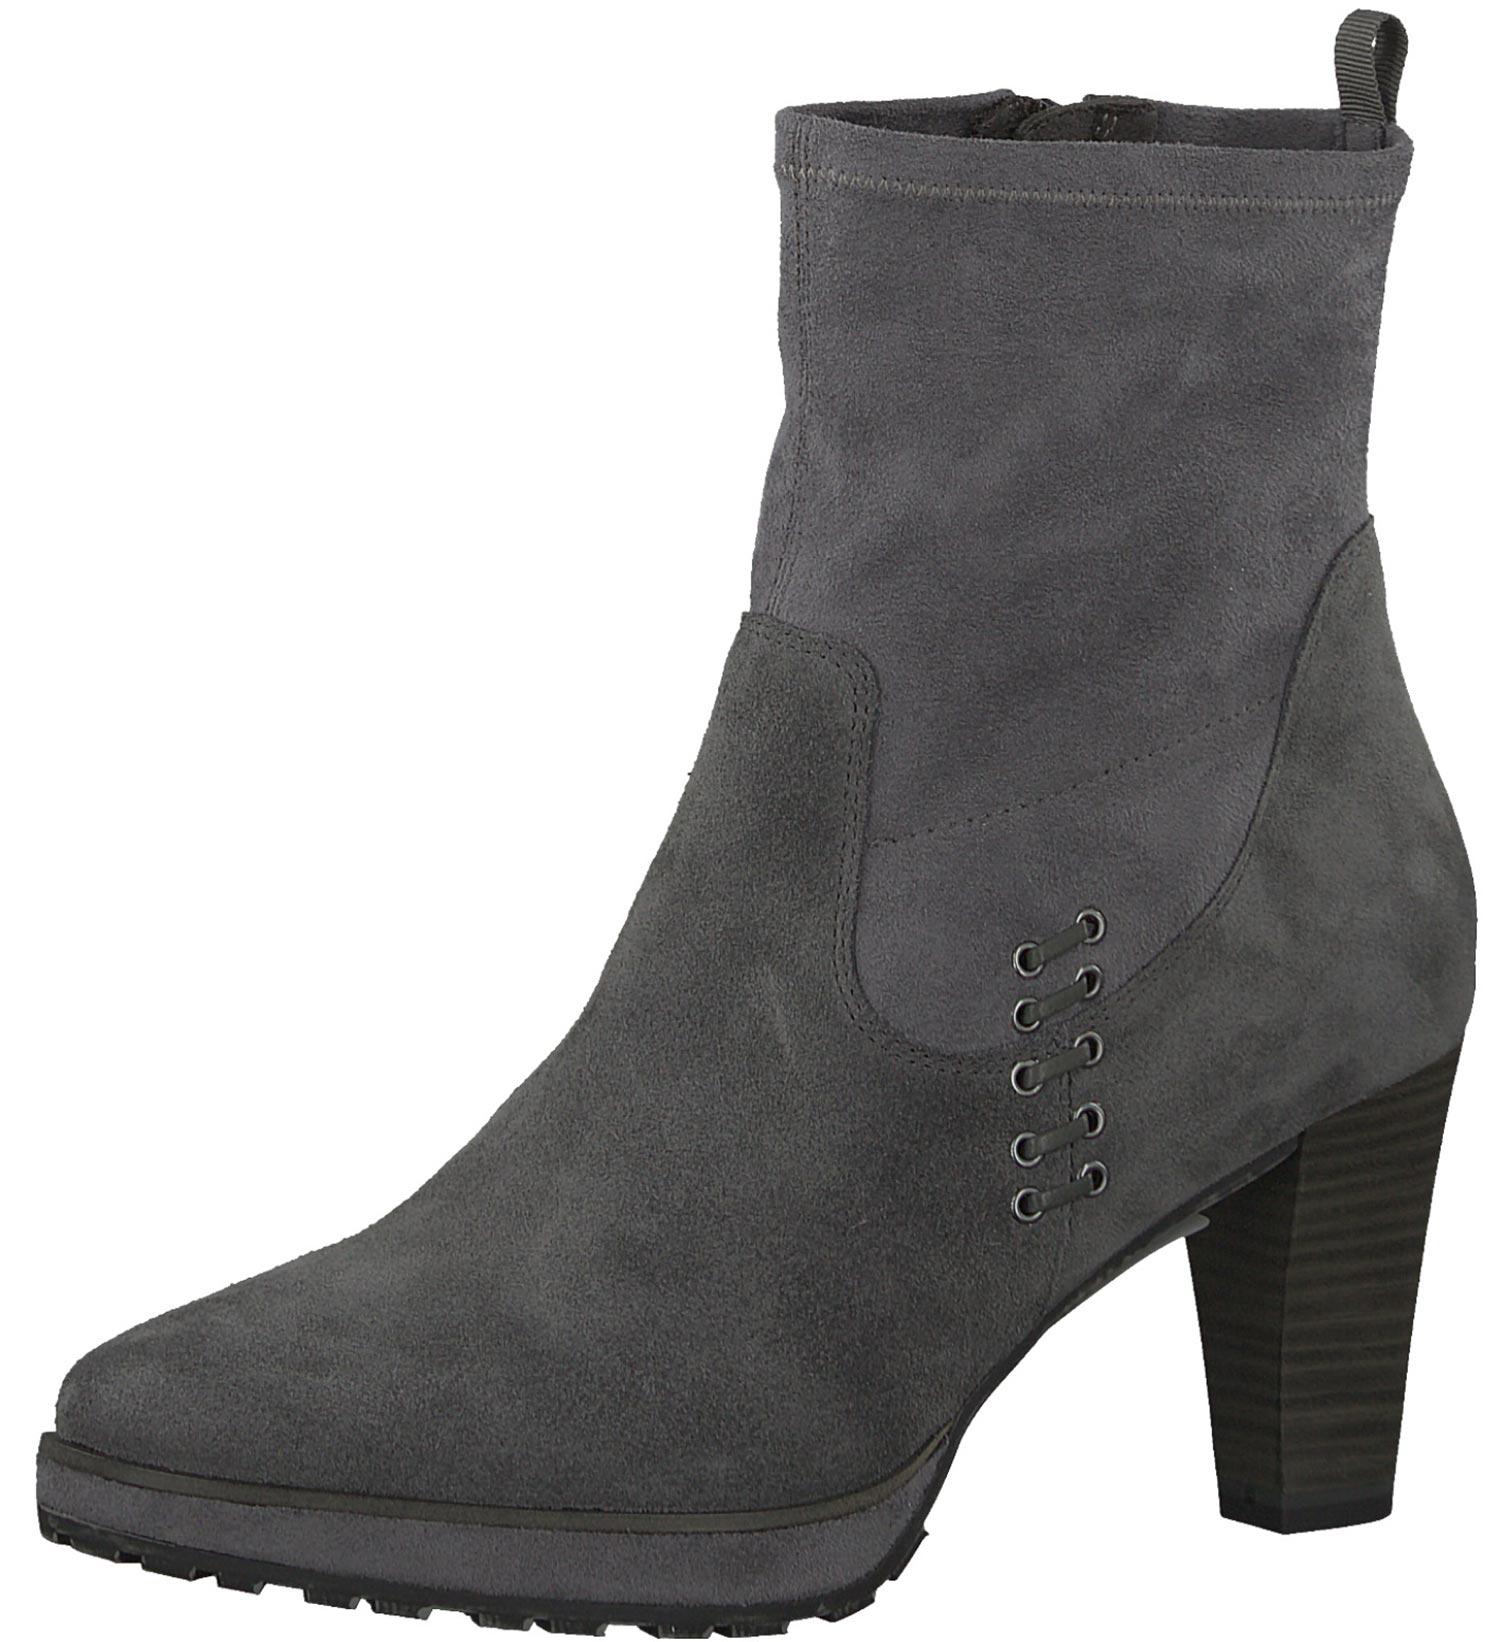 e0c94298c5fdc6 Tamaris Vicky Damen Stiefeletten Stiefel Boots 25319-29 206 Grau Neu ...